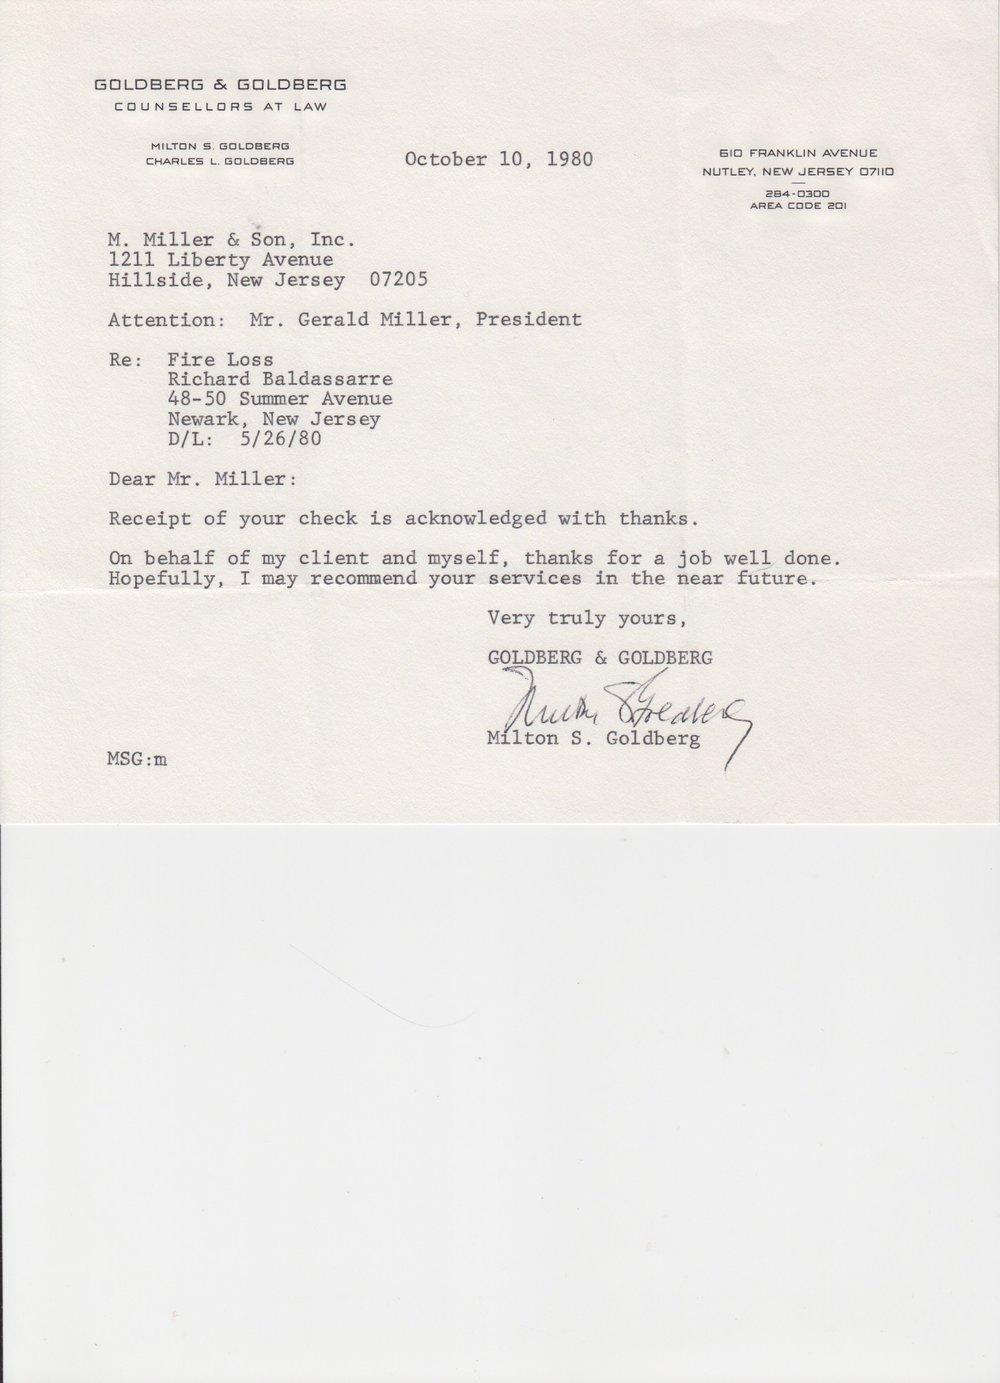 Goldberg & Goldberg 1980.jpeg